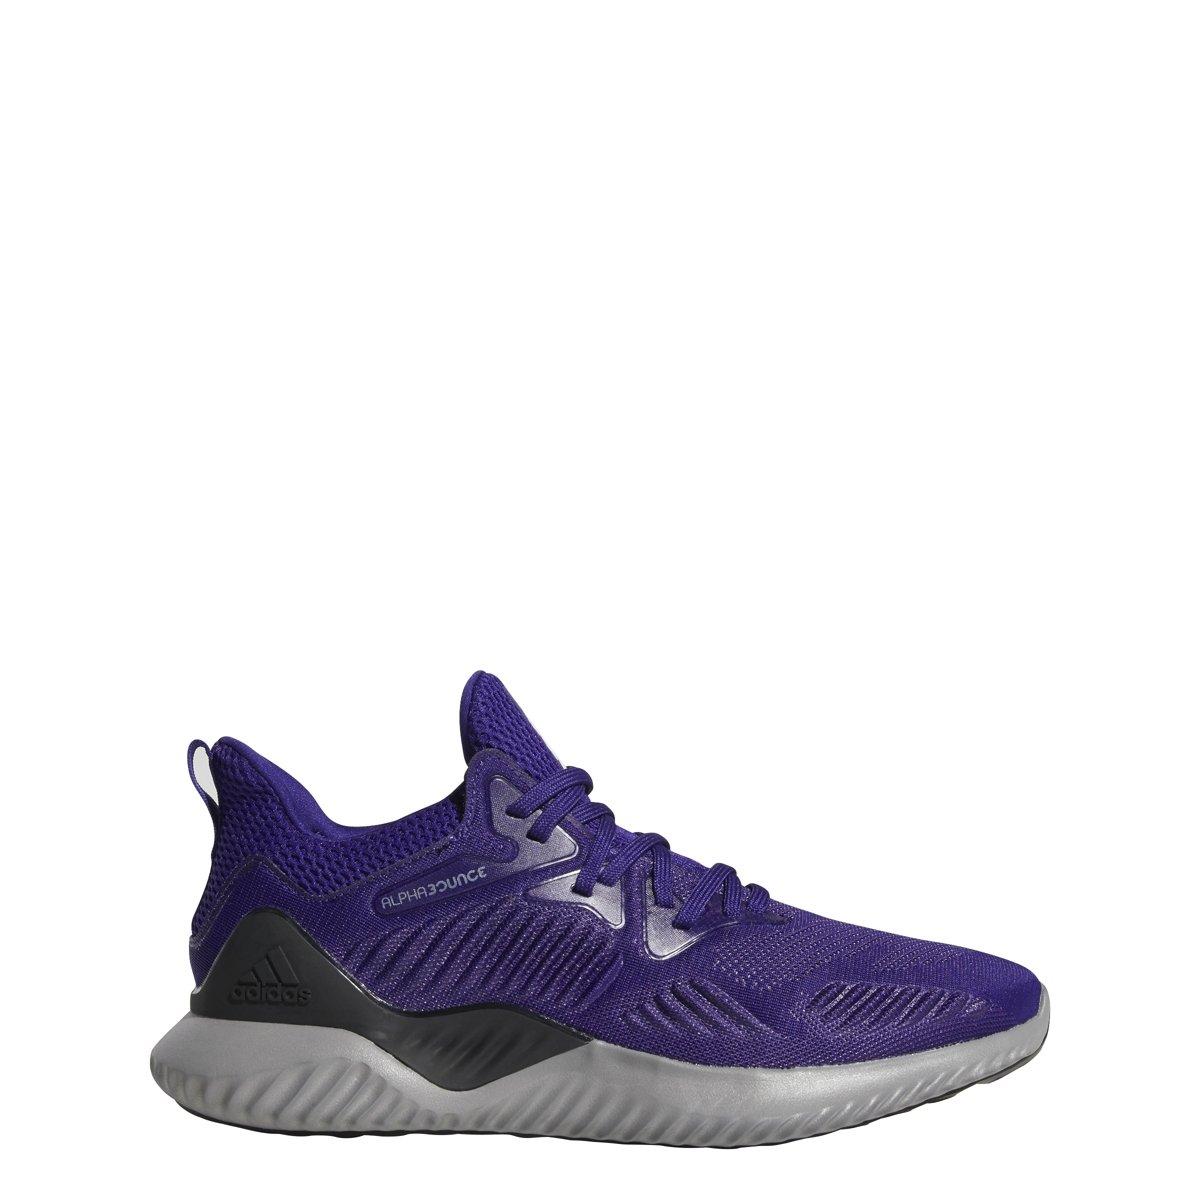 adidas Alphabounce Beyond Team Shoe Men's Running B077XMT5XW 12.5 D(M) US|Real Purple/White/Black